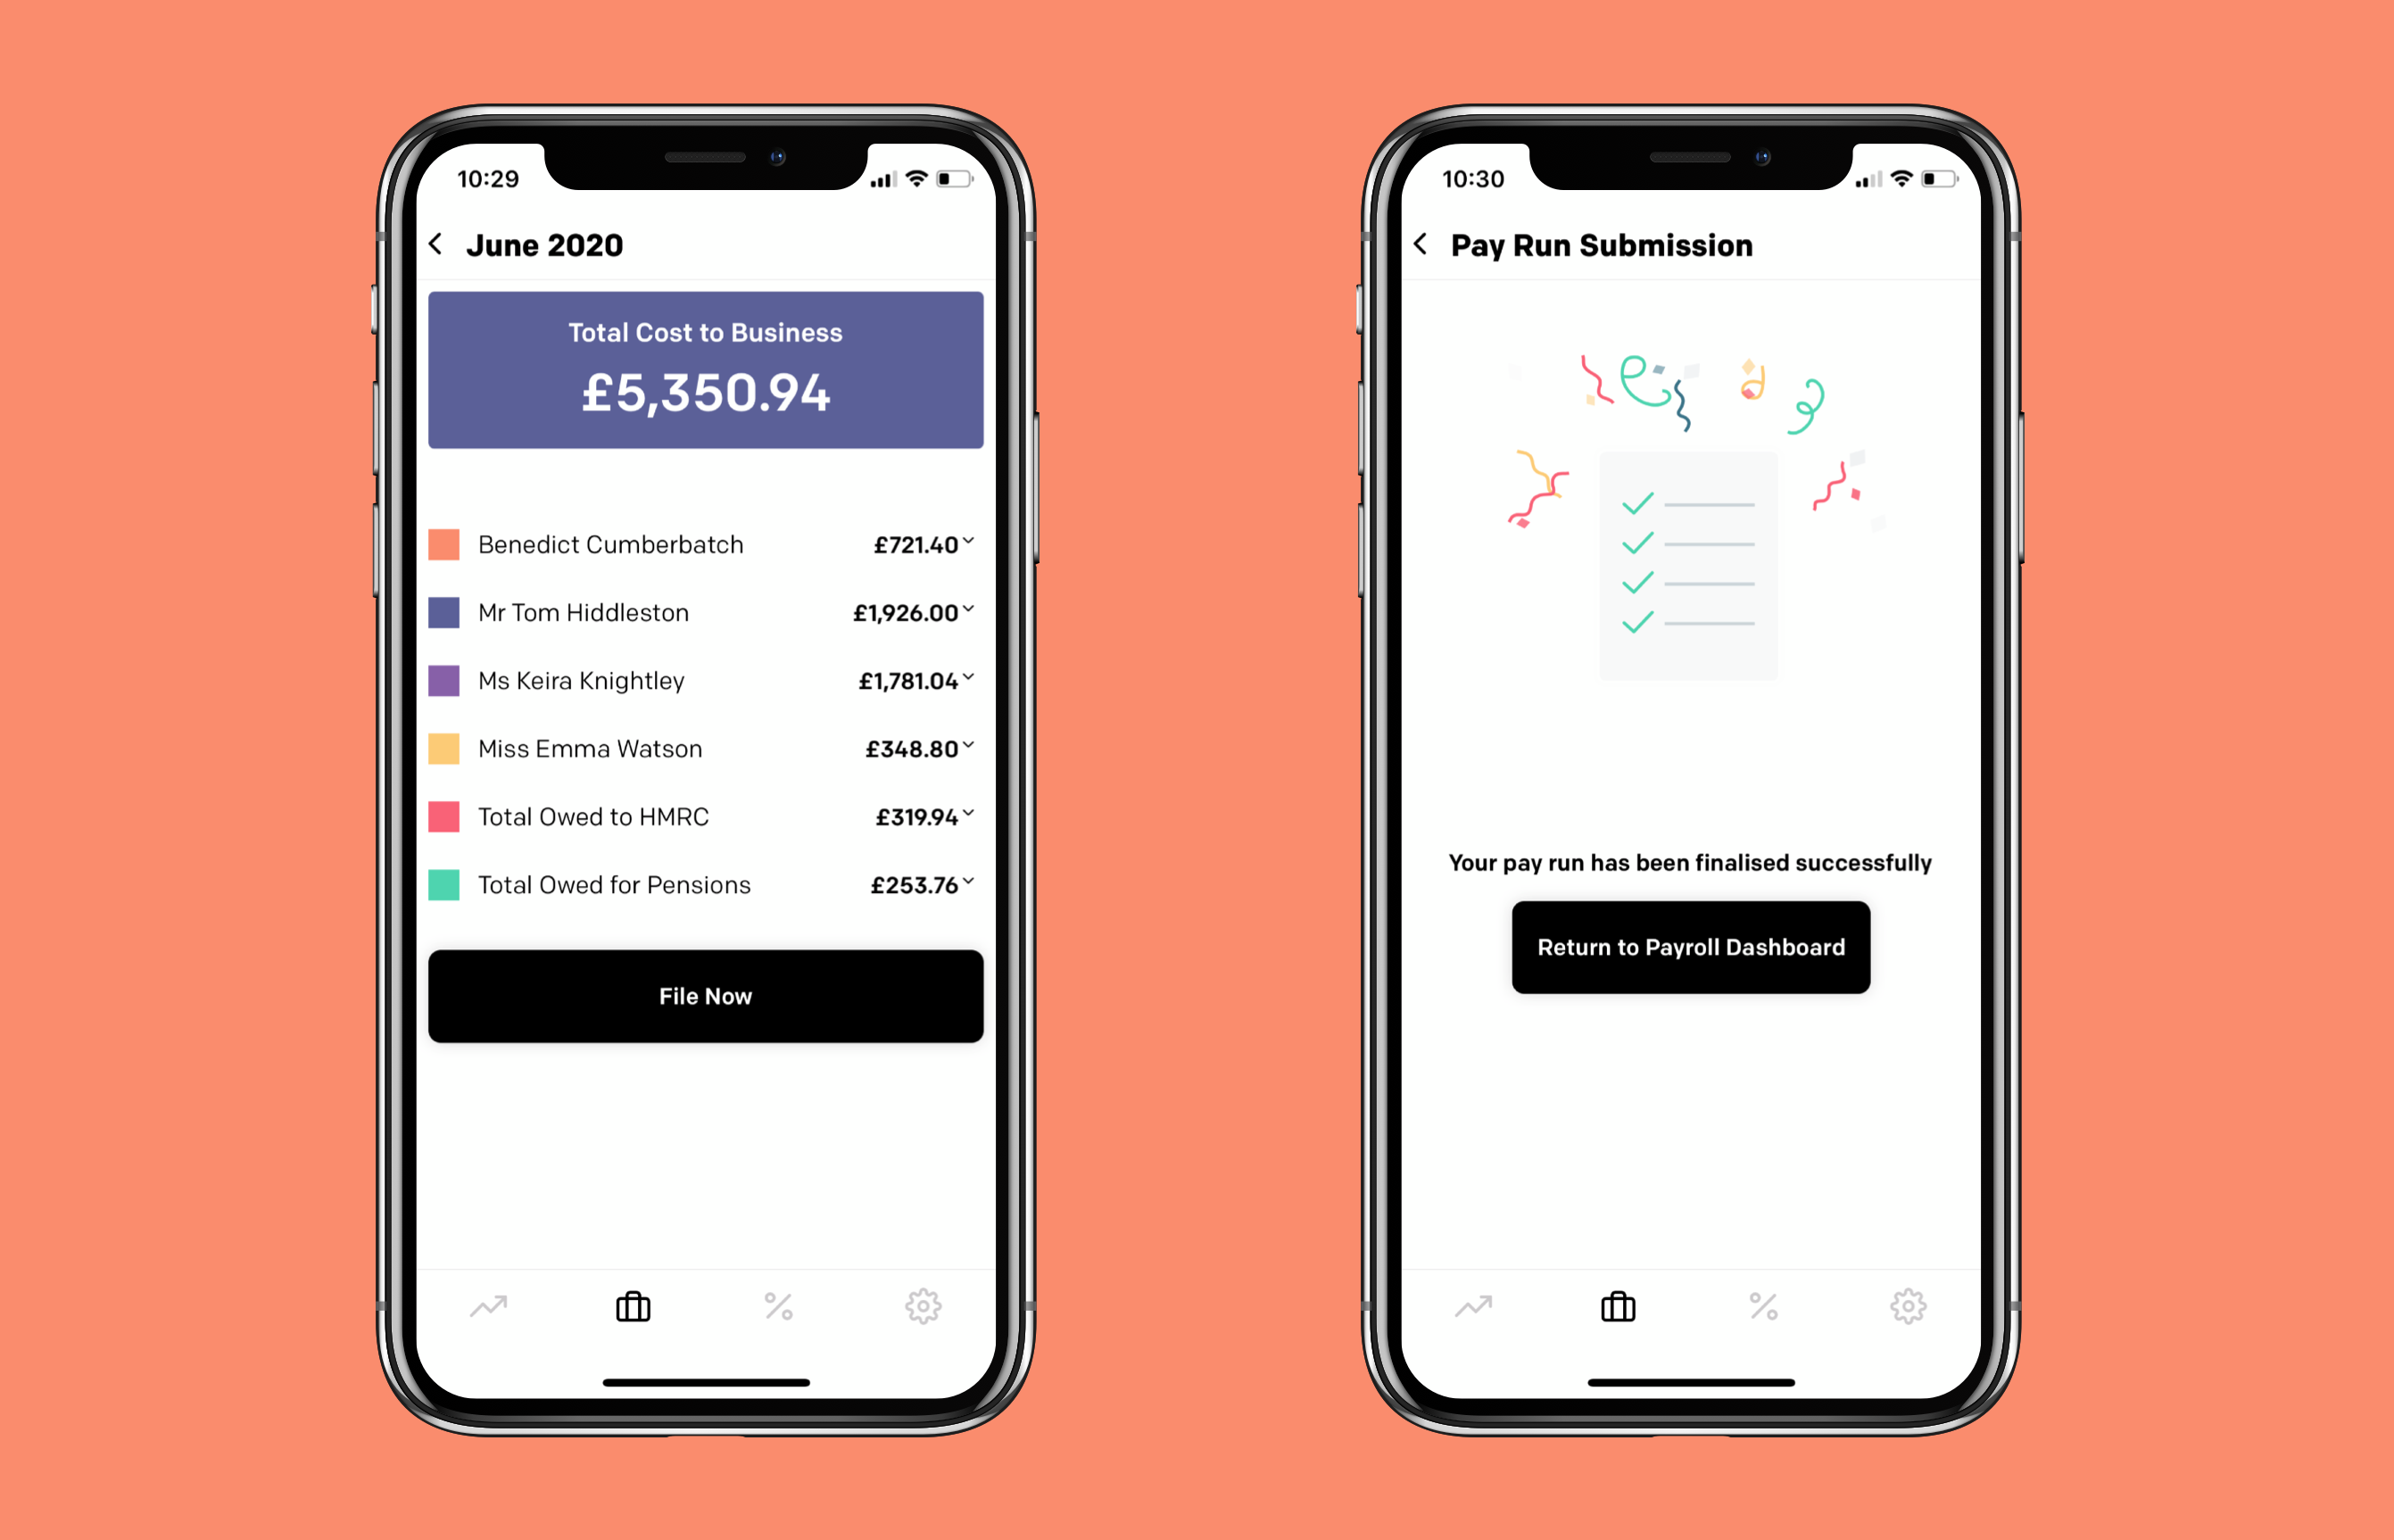 Screenshots of the app displaying payroll